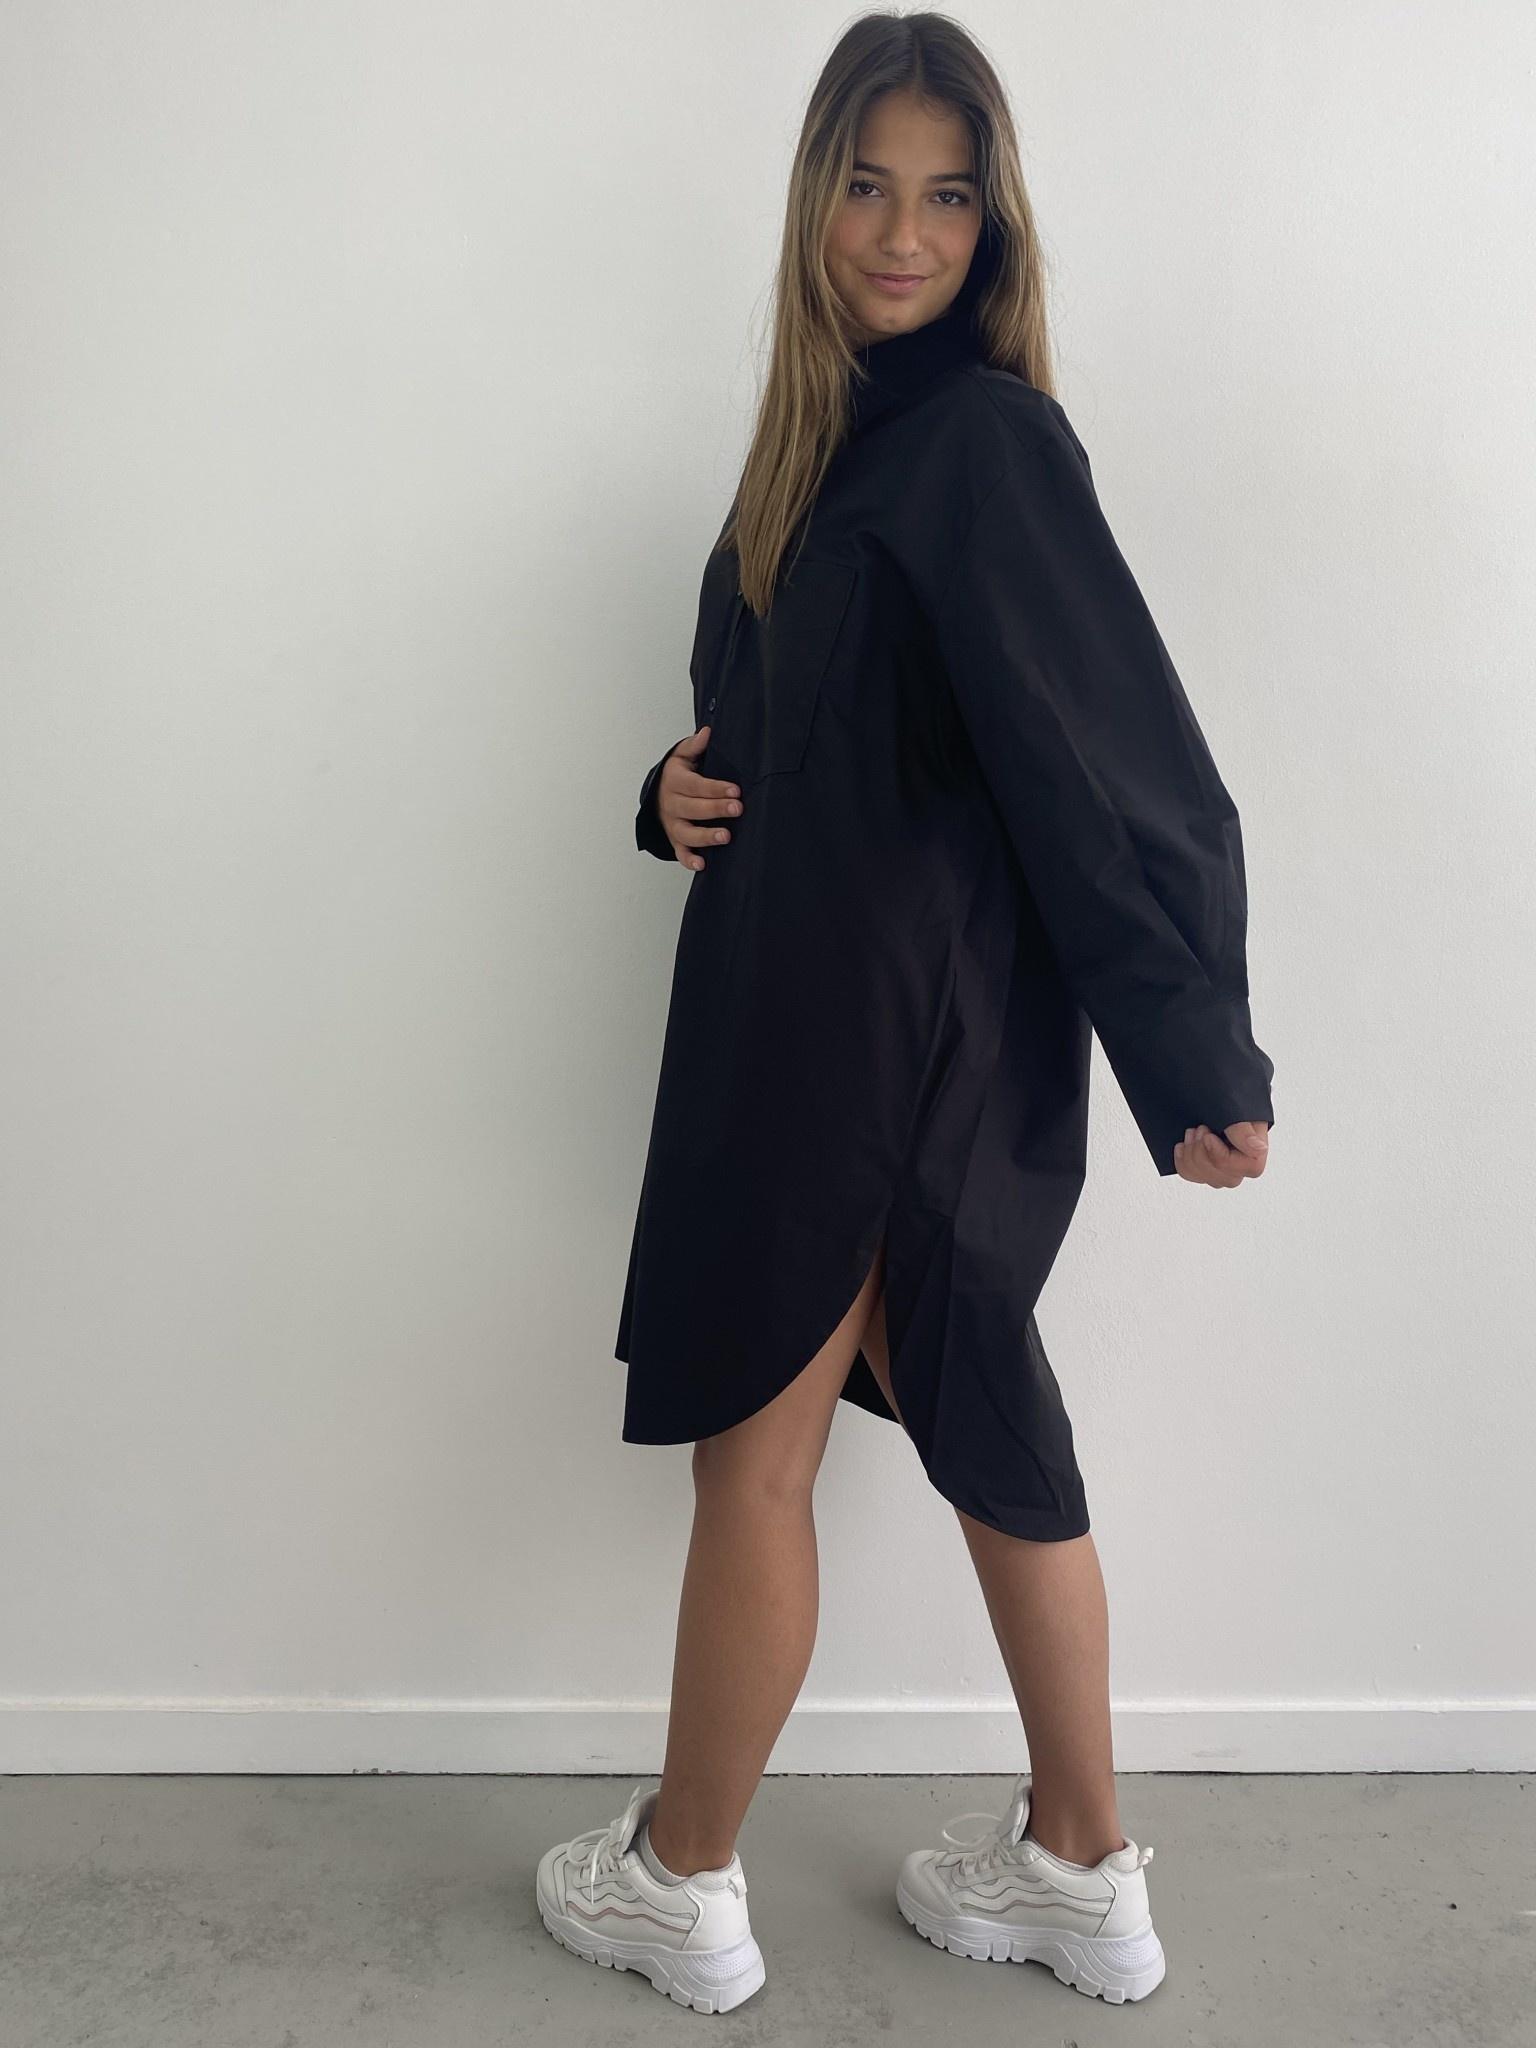 Andrea oversized shirt Black-3